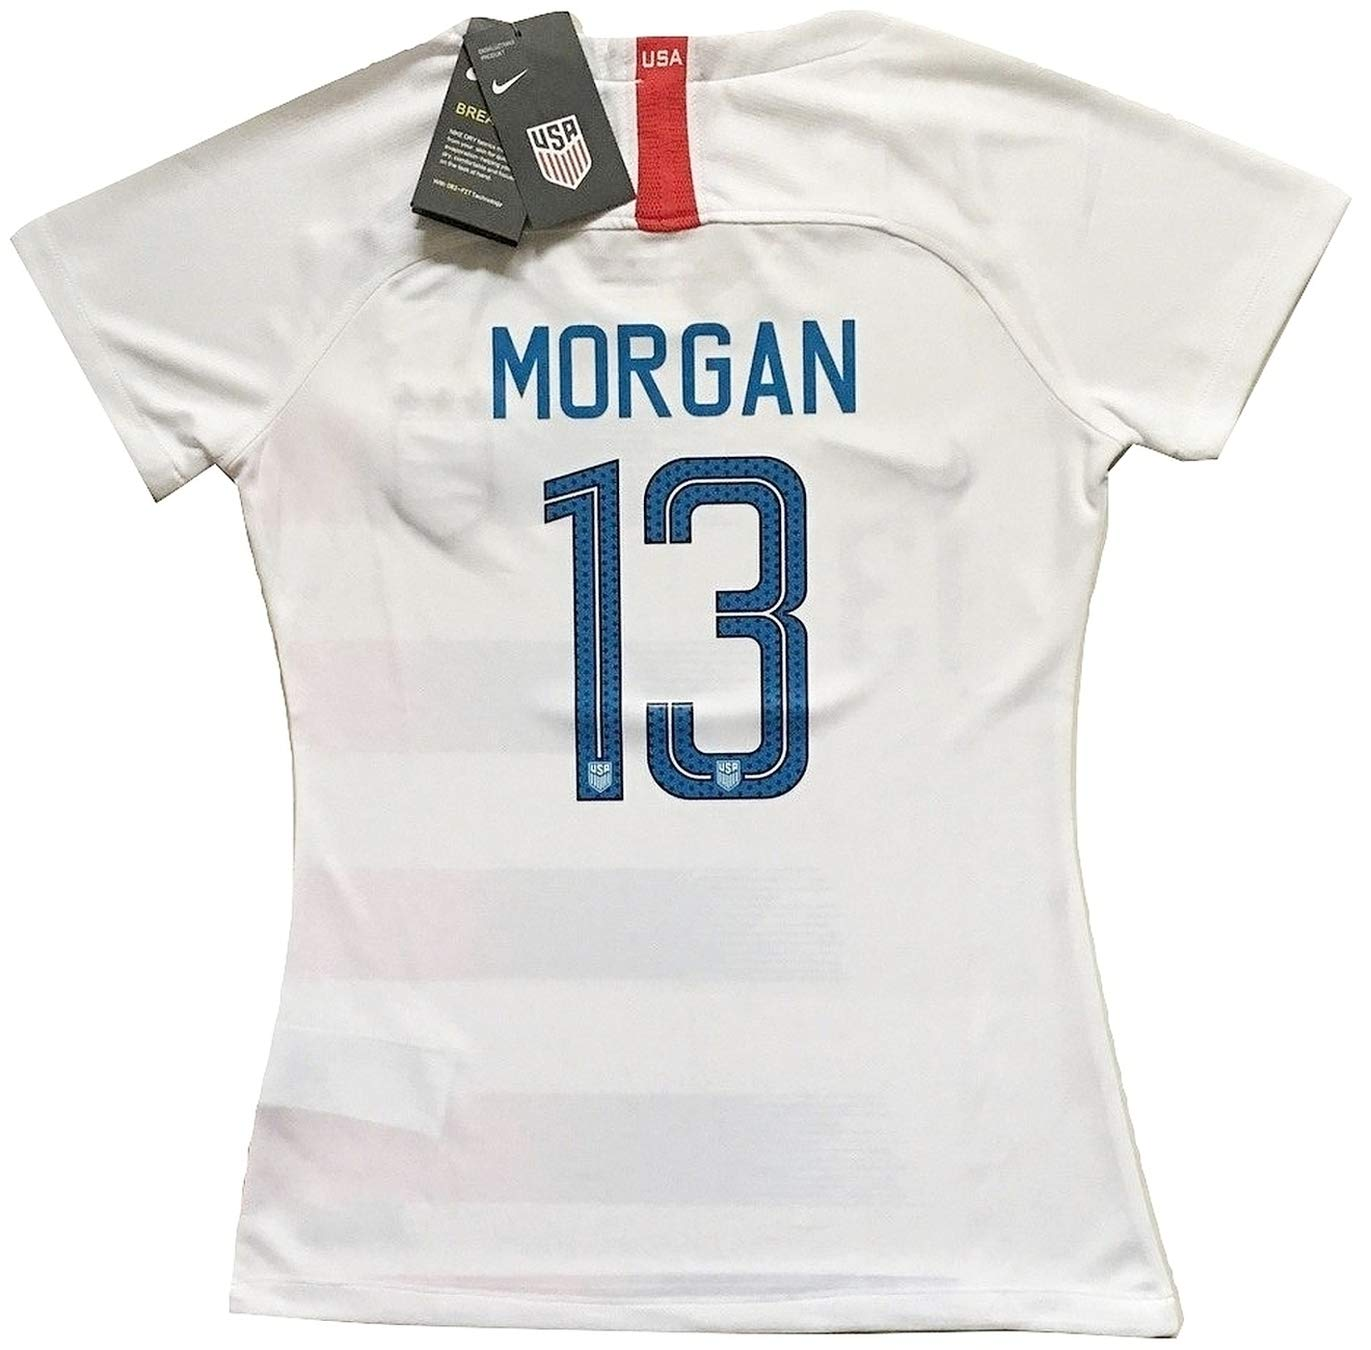 Enevva Slim Fit Morgan #13 Women's USA National Team 2018-2019 Home Soccer Jersey White (Women's Large)